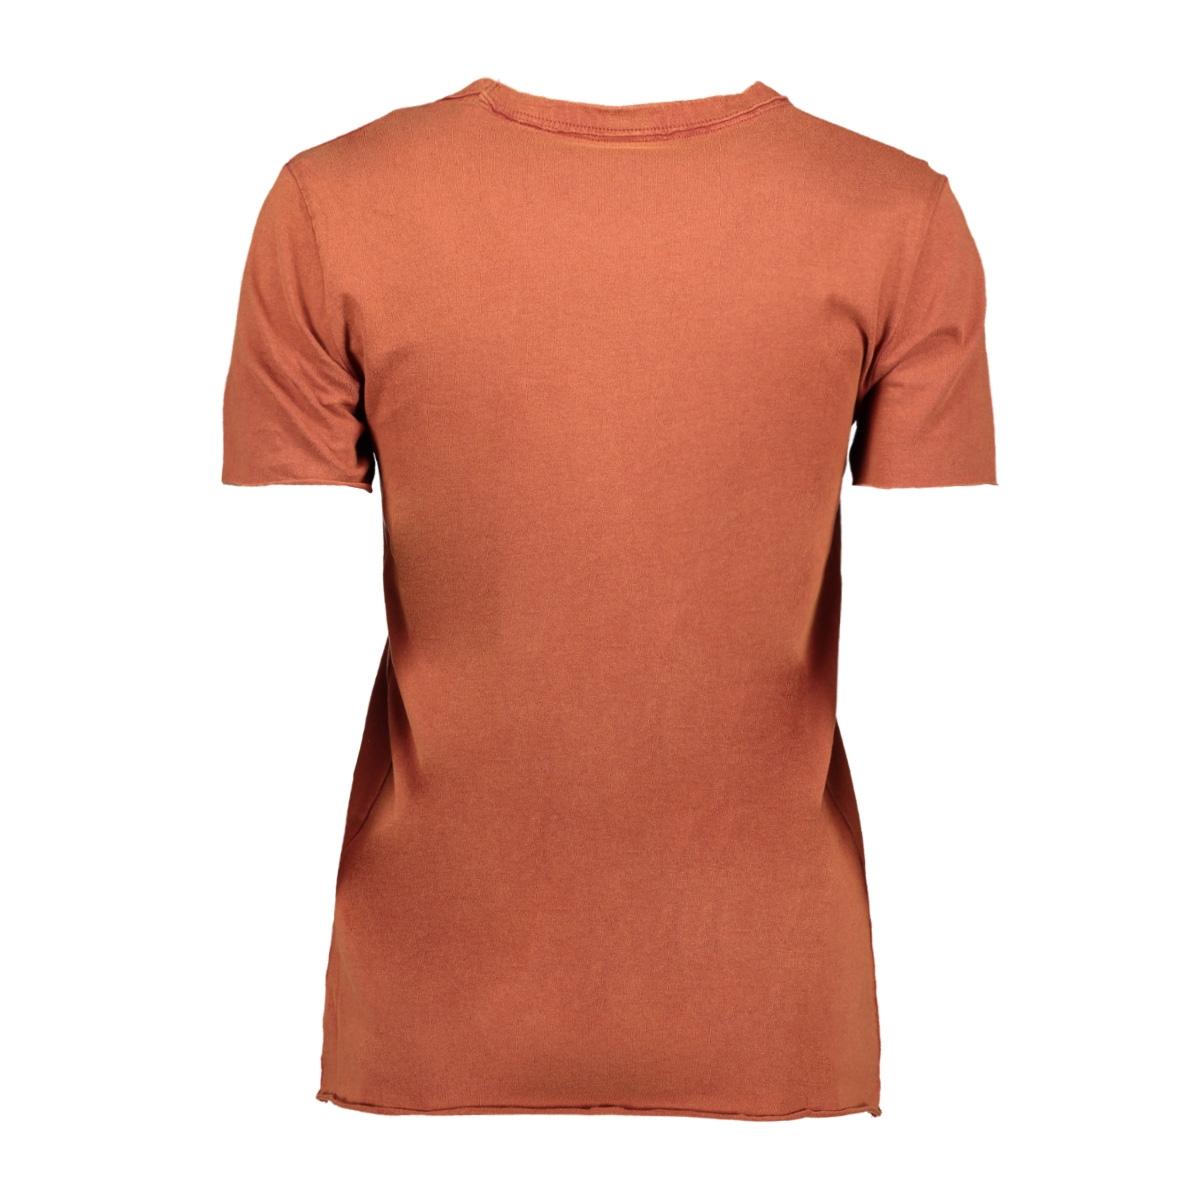 onllucy life reg s/s top cs jrs 15211712 only t-shirt burnt henna/faith